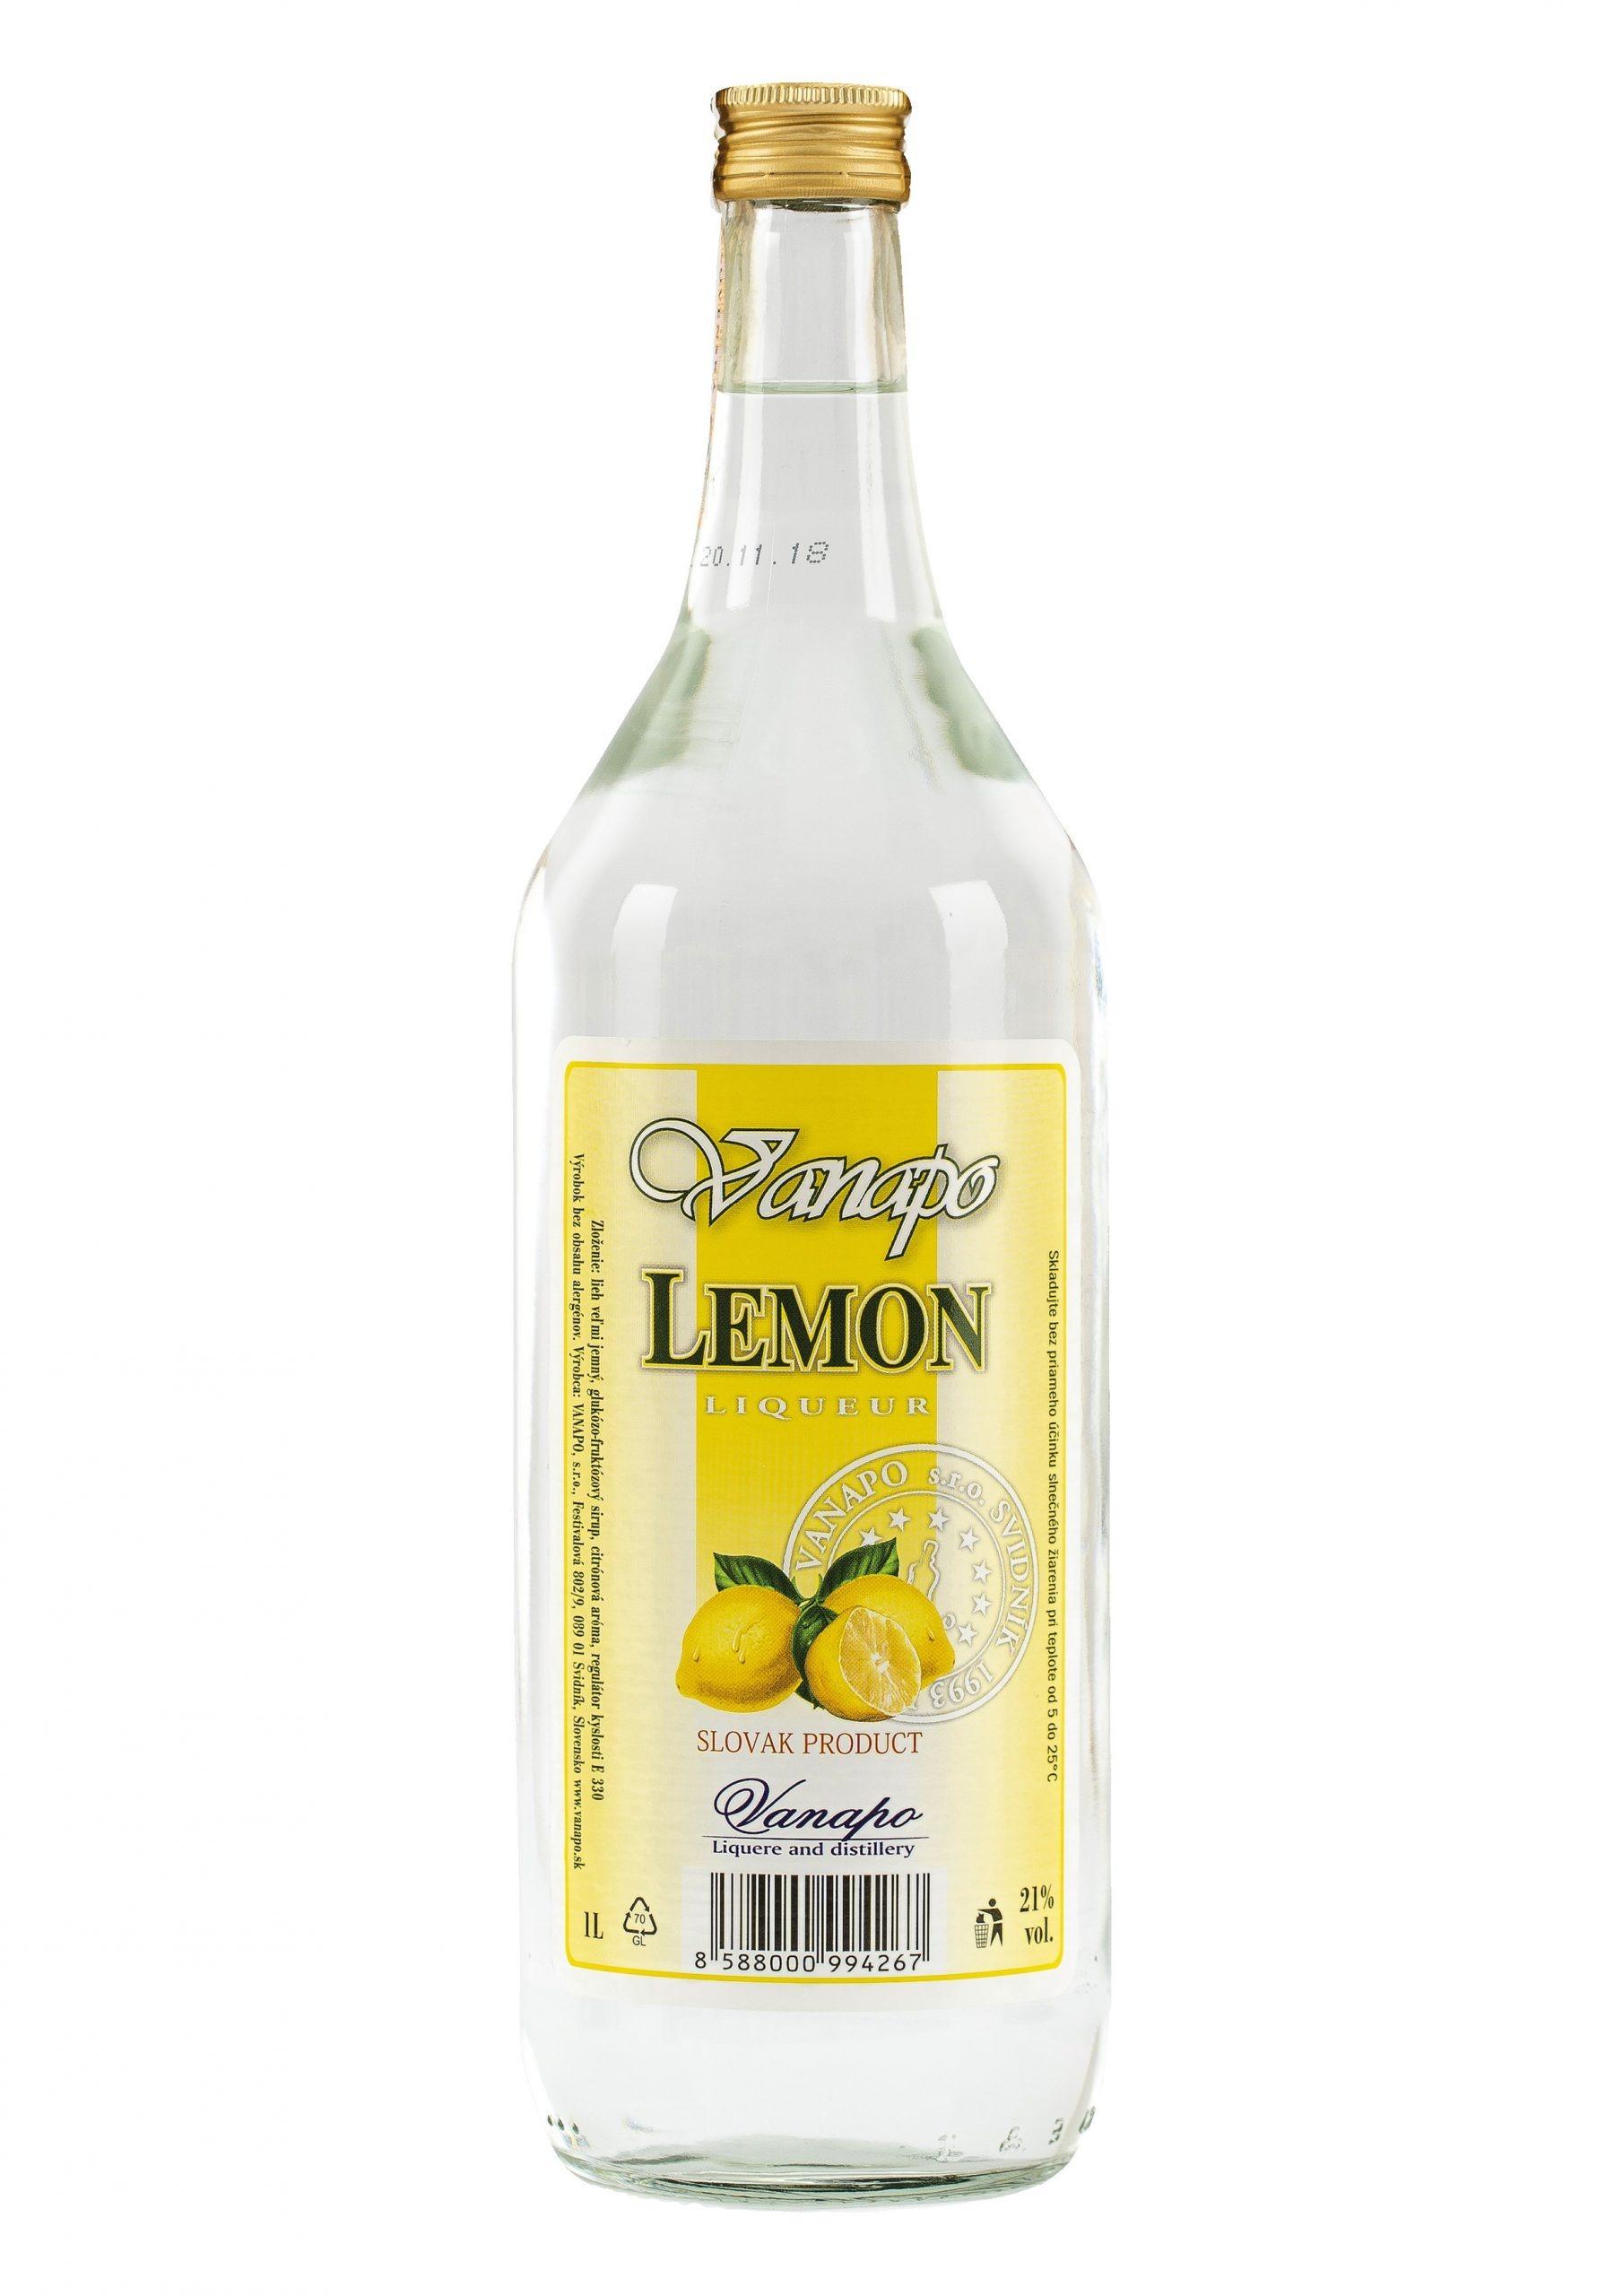 Lemon liker 21 1L scaled 1 - Lemon likér